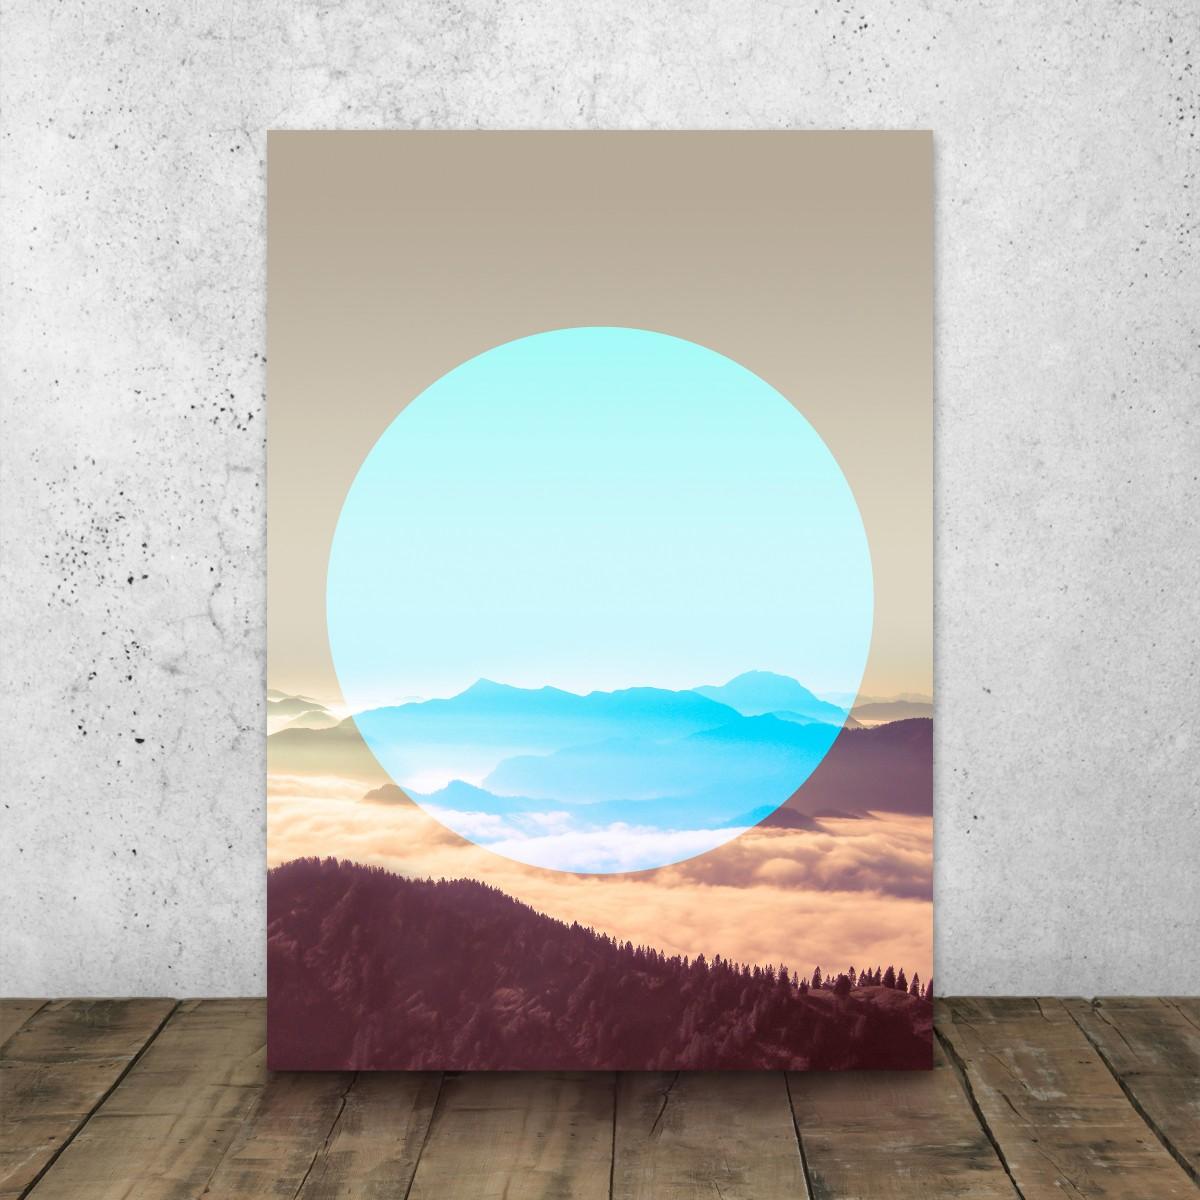 JOE MANIA / Modern Artprint Poster / Circular Landscapes (Alps)